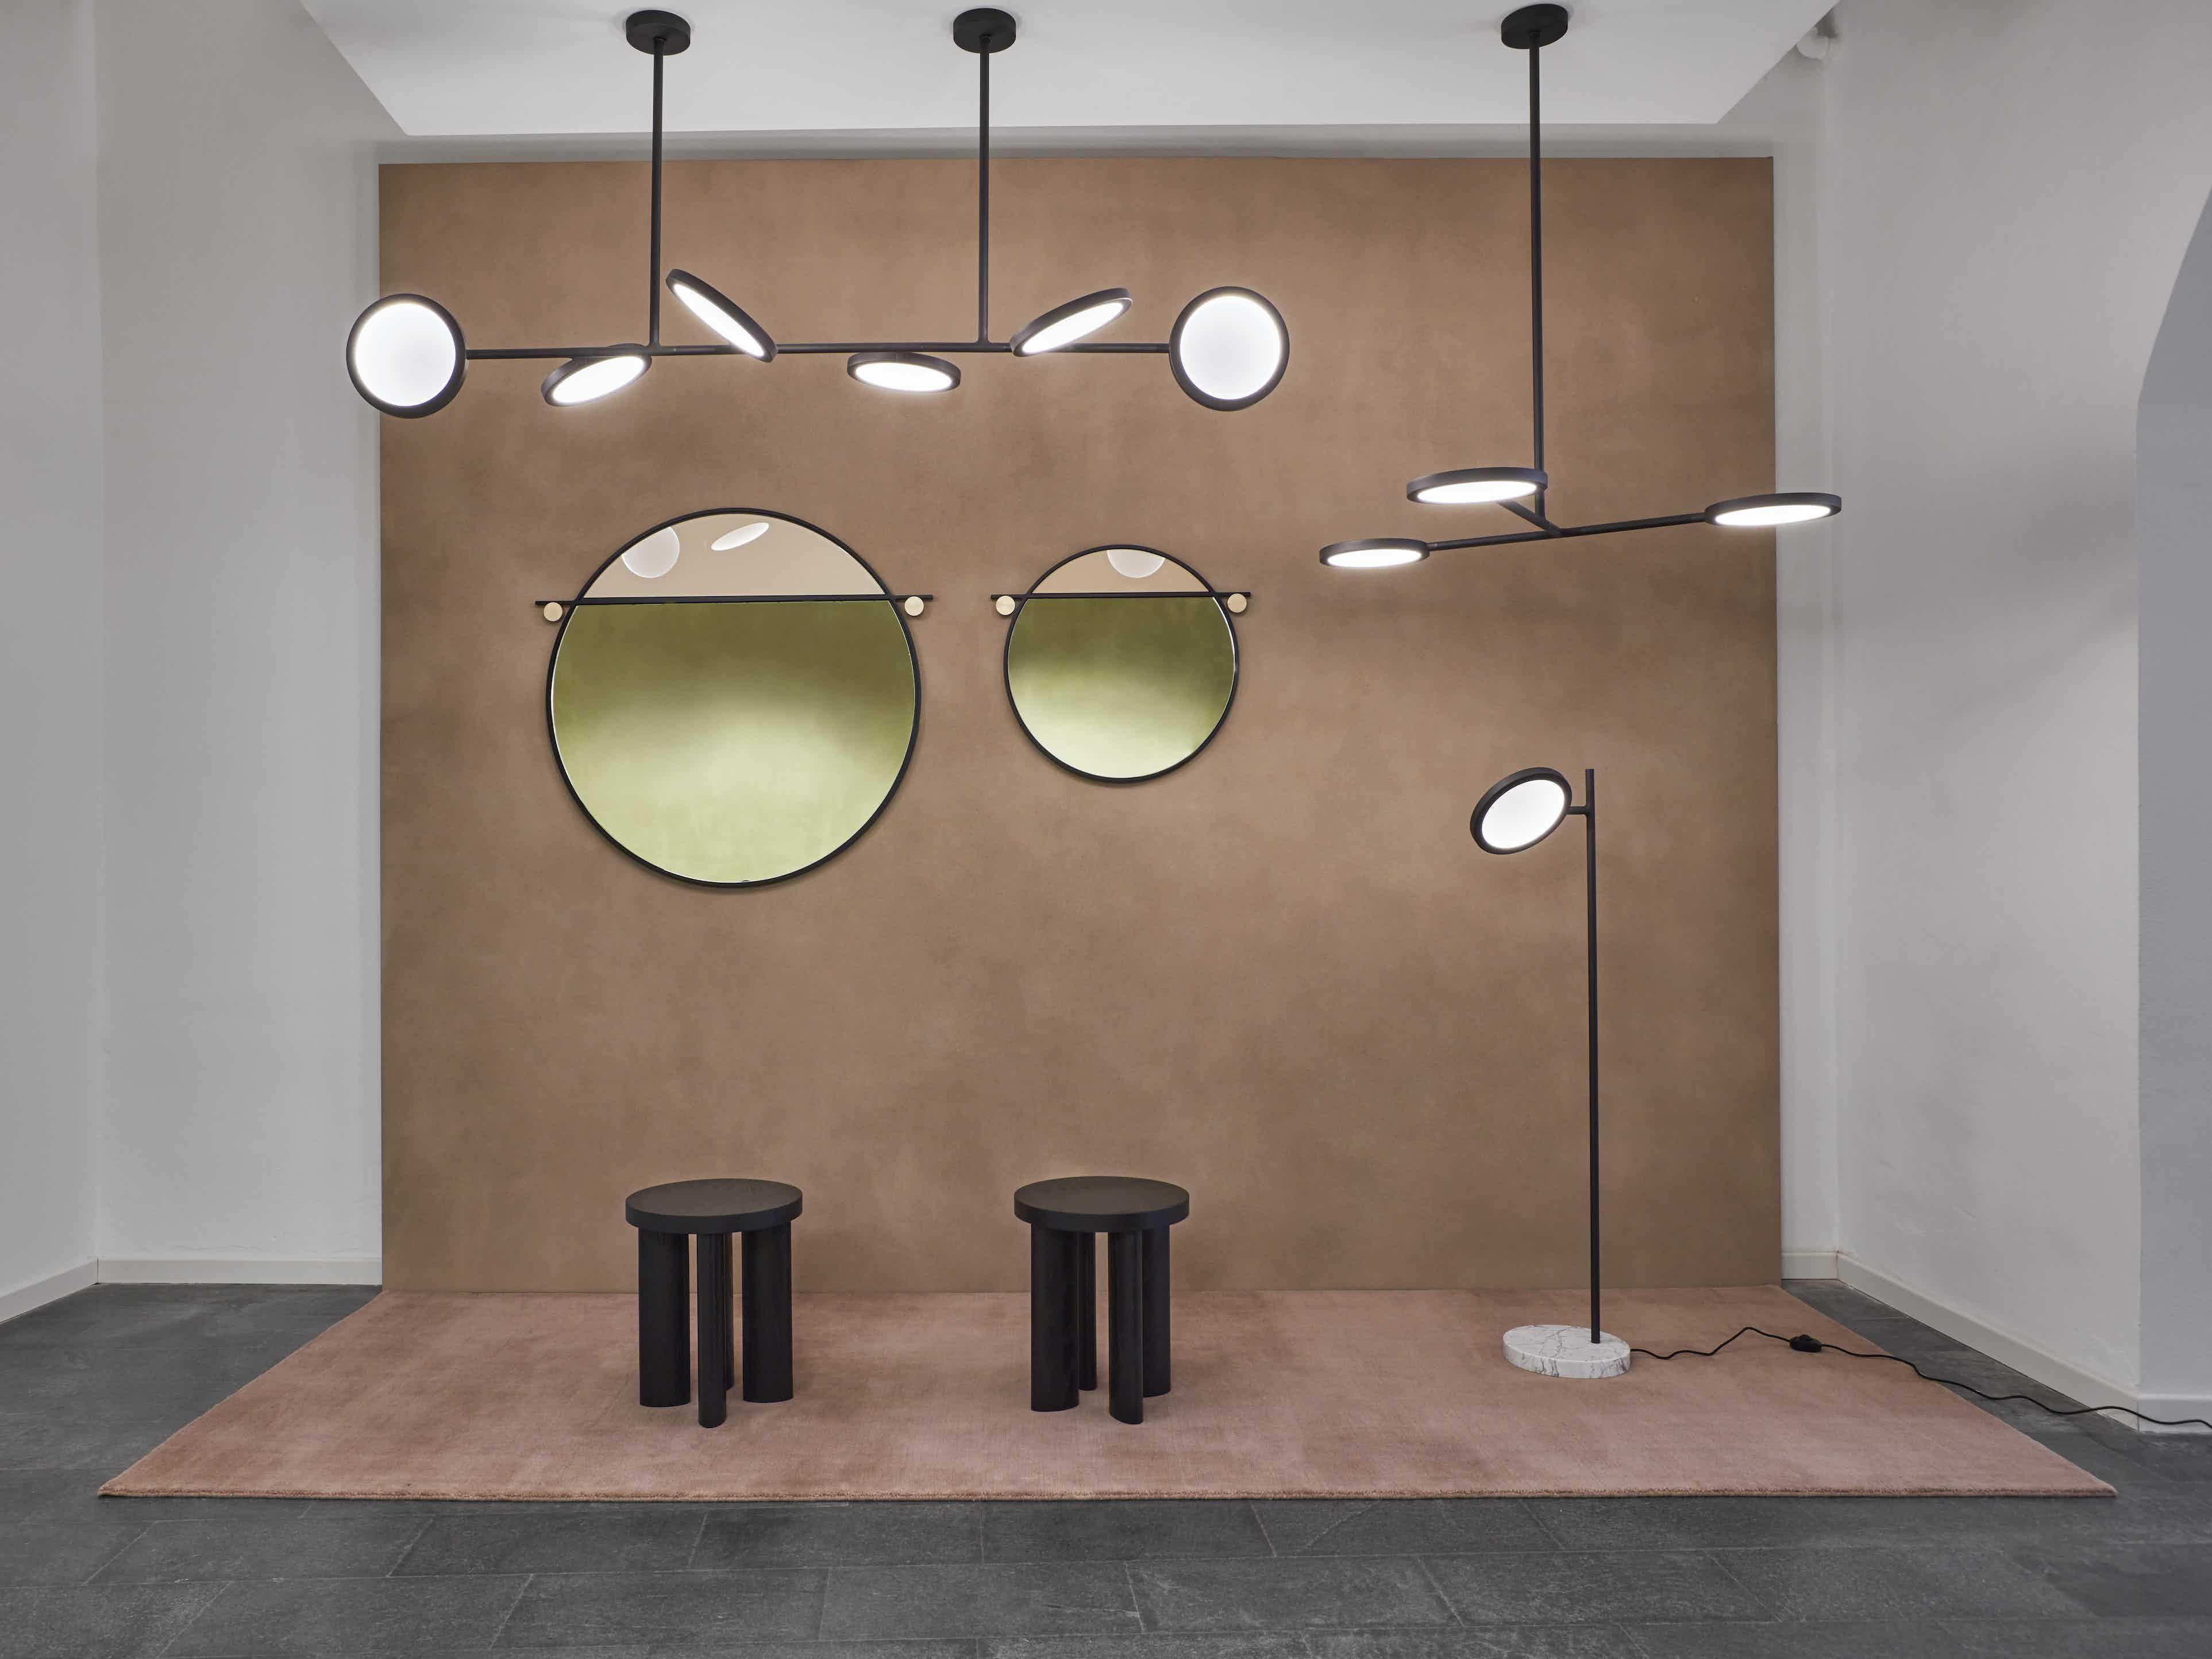 Matter Made Discus Lights Abal Mirrors Orbit Stools